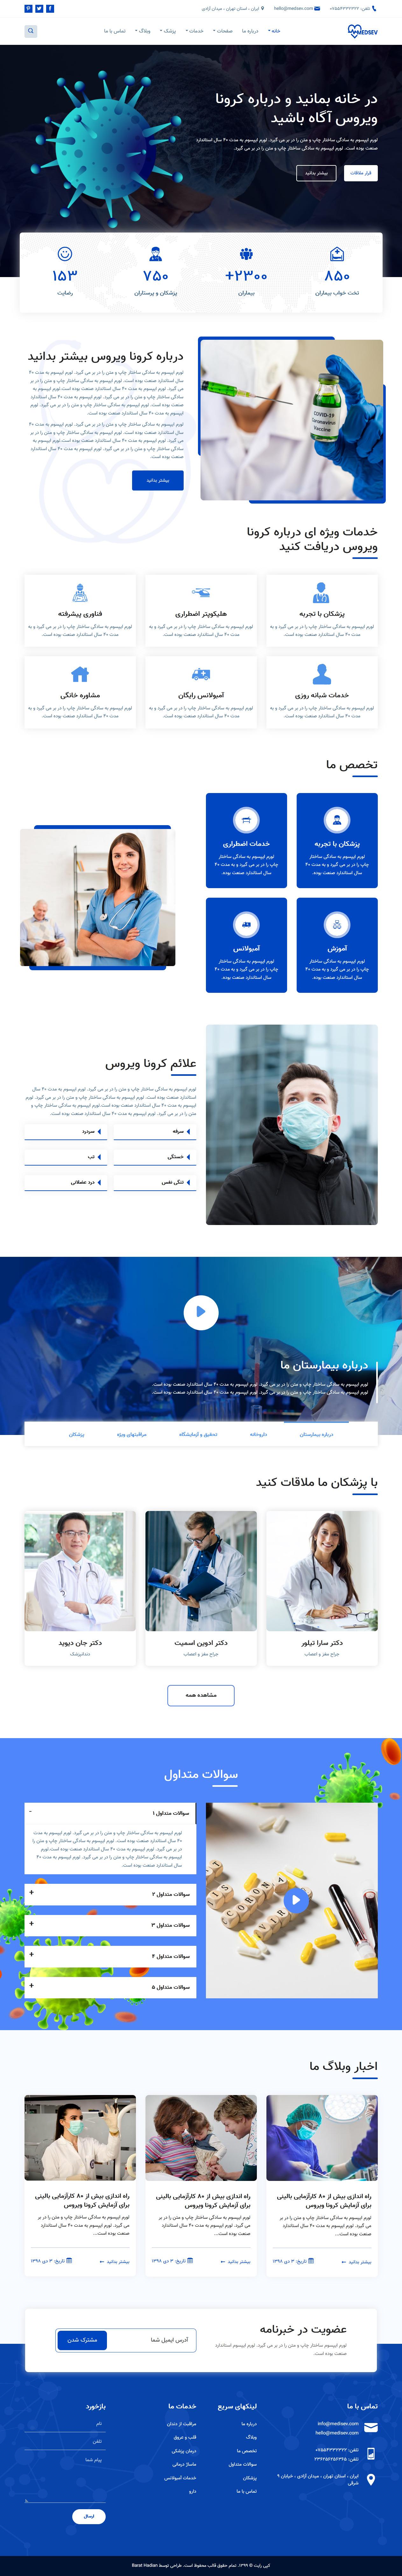 قالب HTML Medsev، قالب HTML پزشکی مدوسف